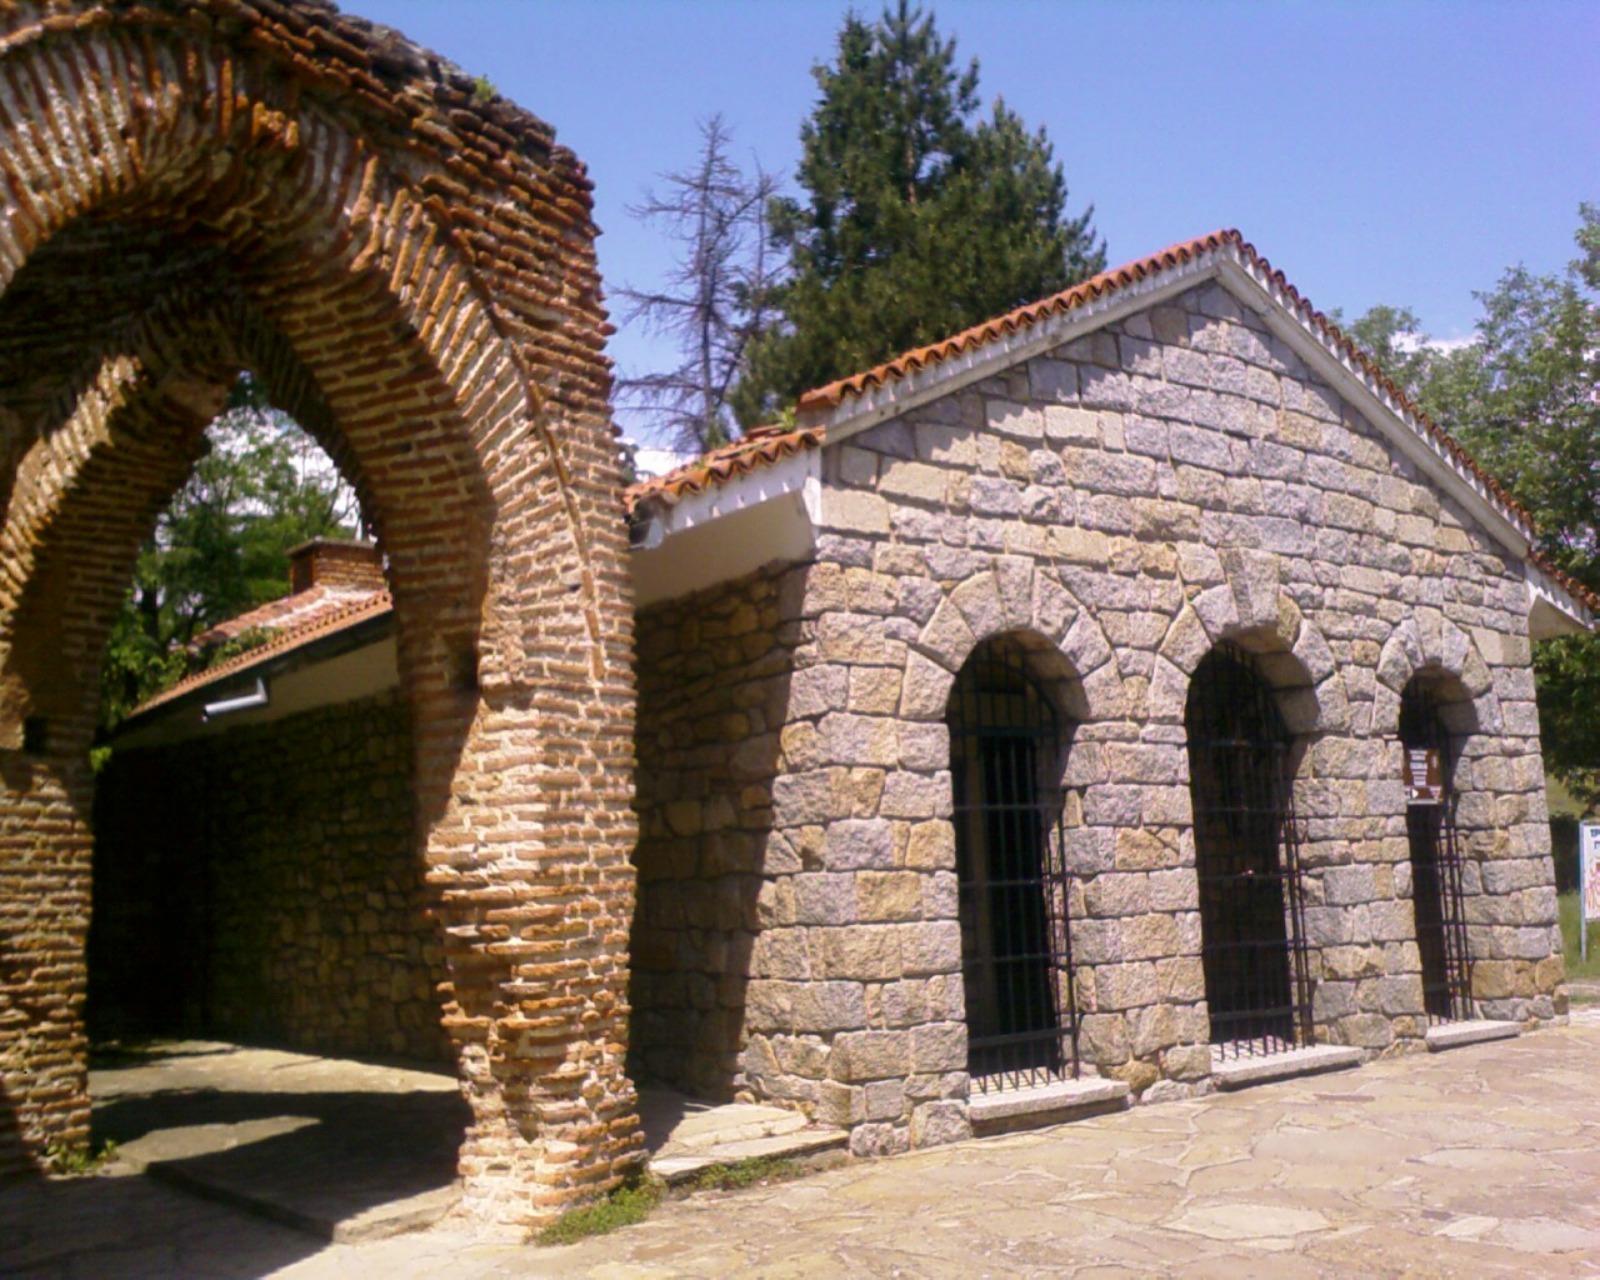 bulgaria11-1609772470.jpg